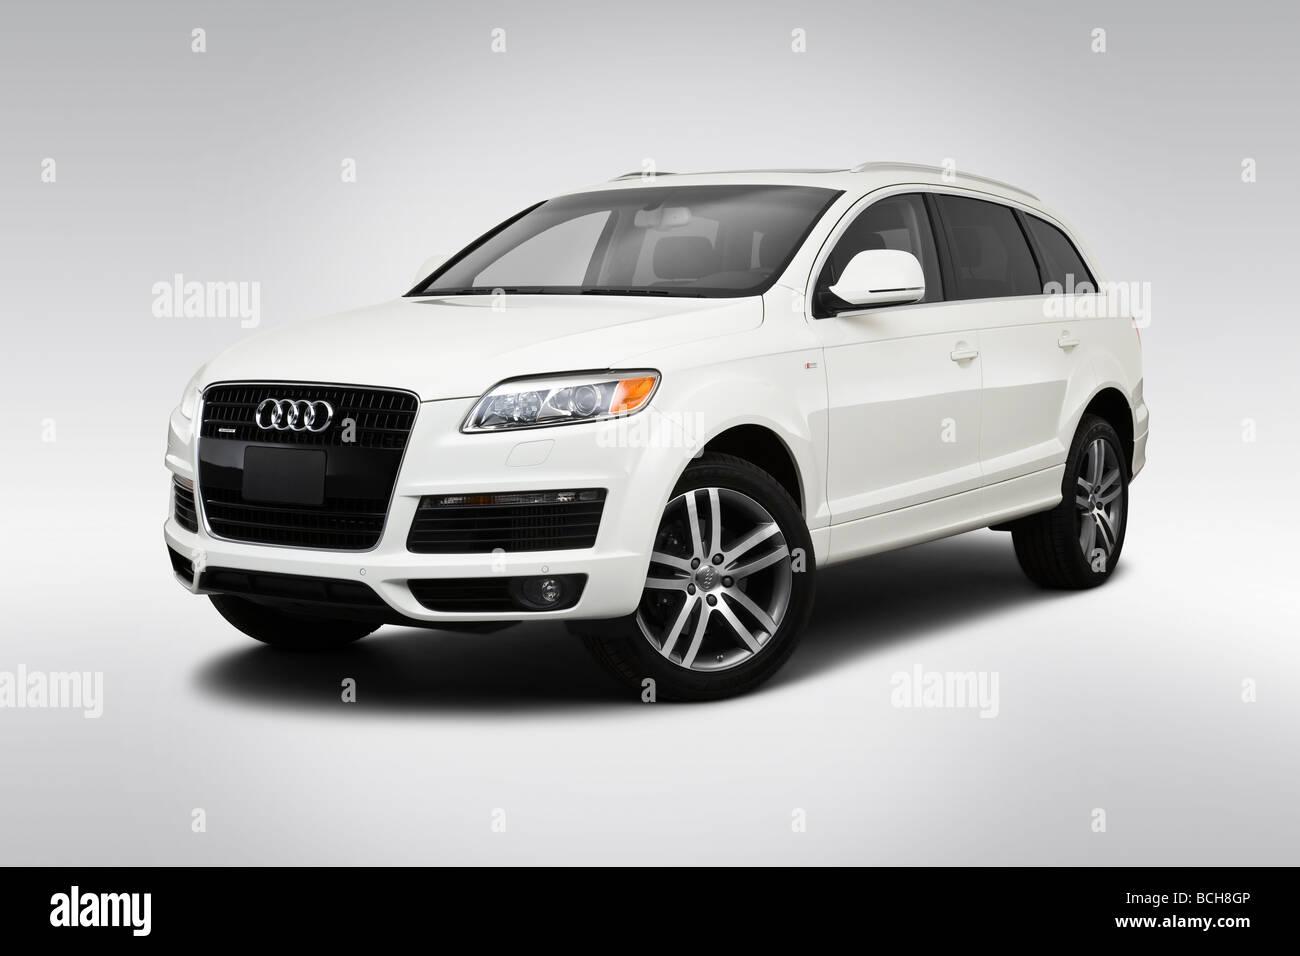 2009 Audi Q7 TDI Premium in White - Front angle view - Stock Image